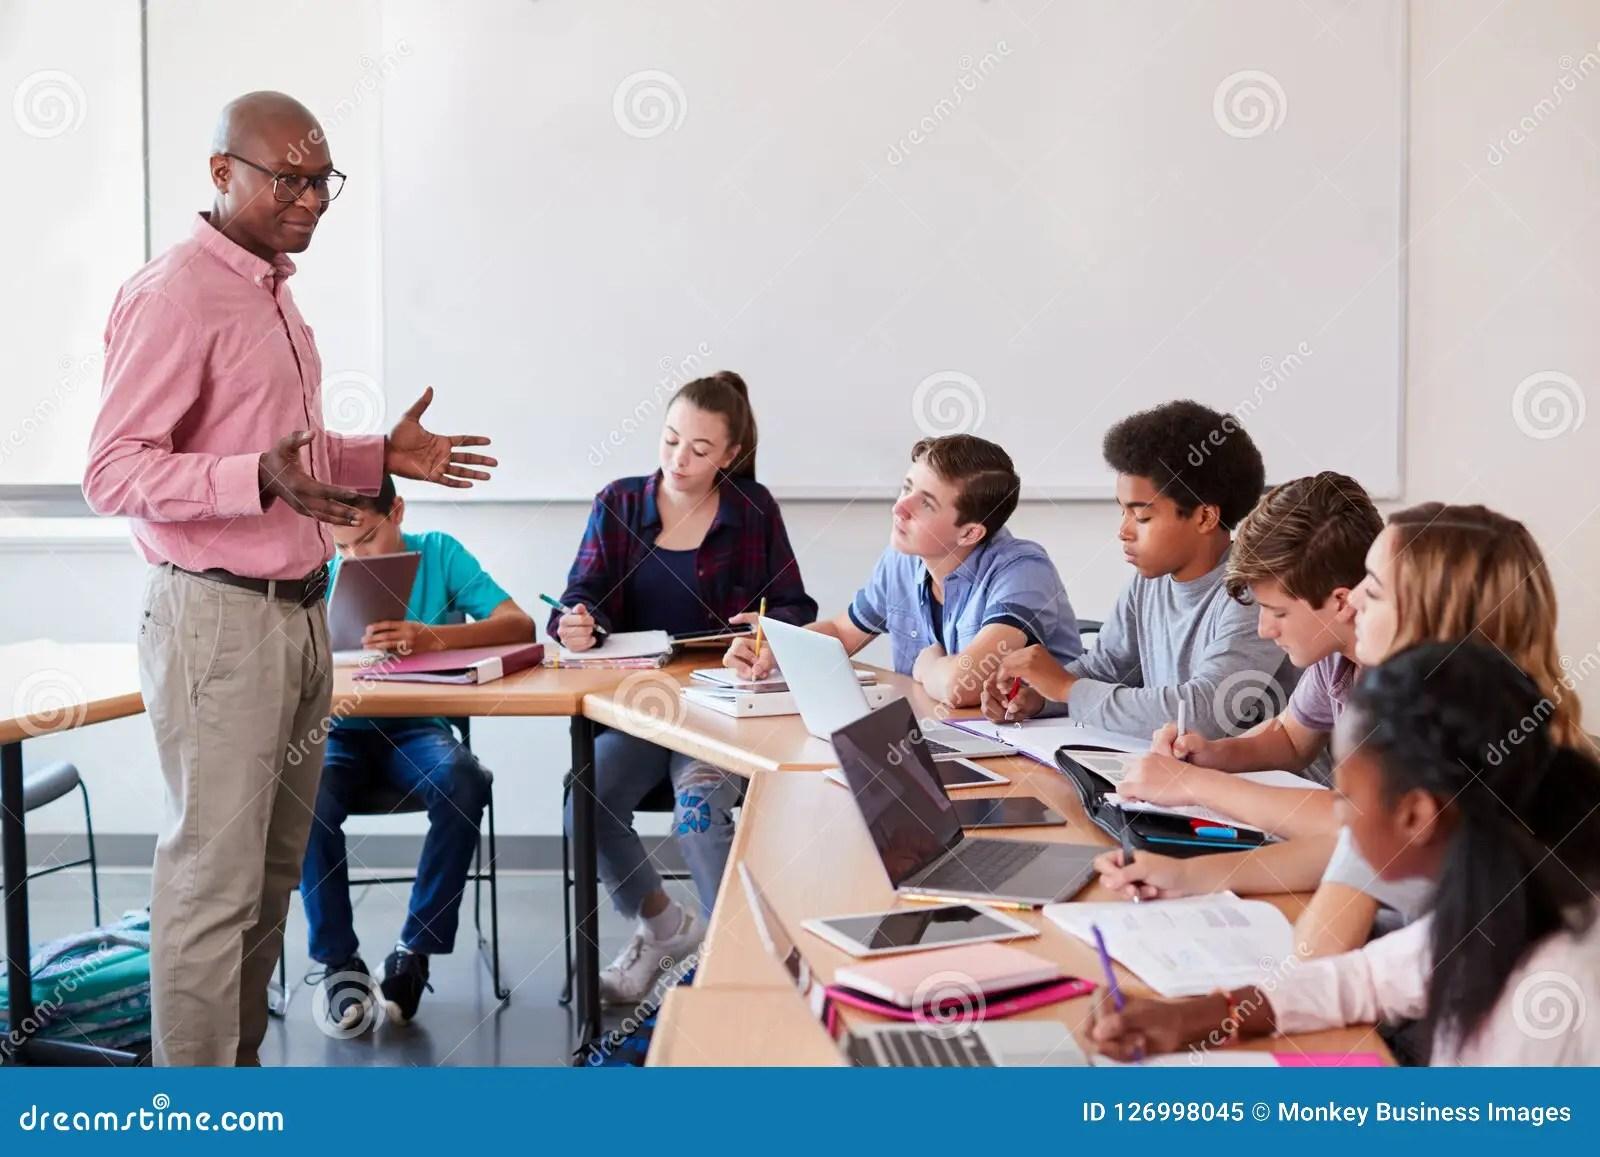 High School Teacher Talking To Pupils Using Digital